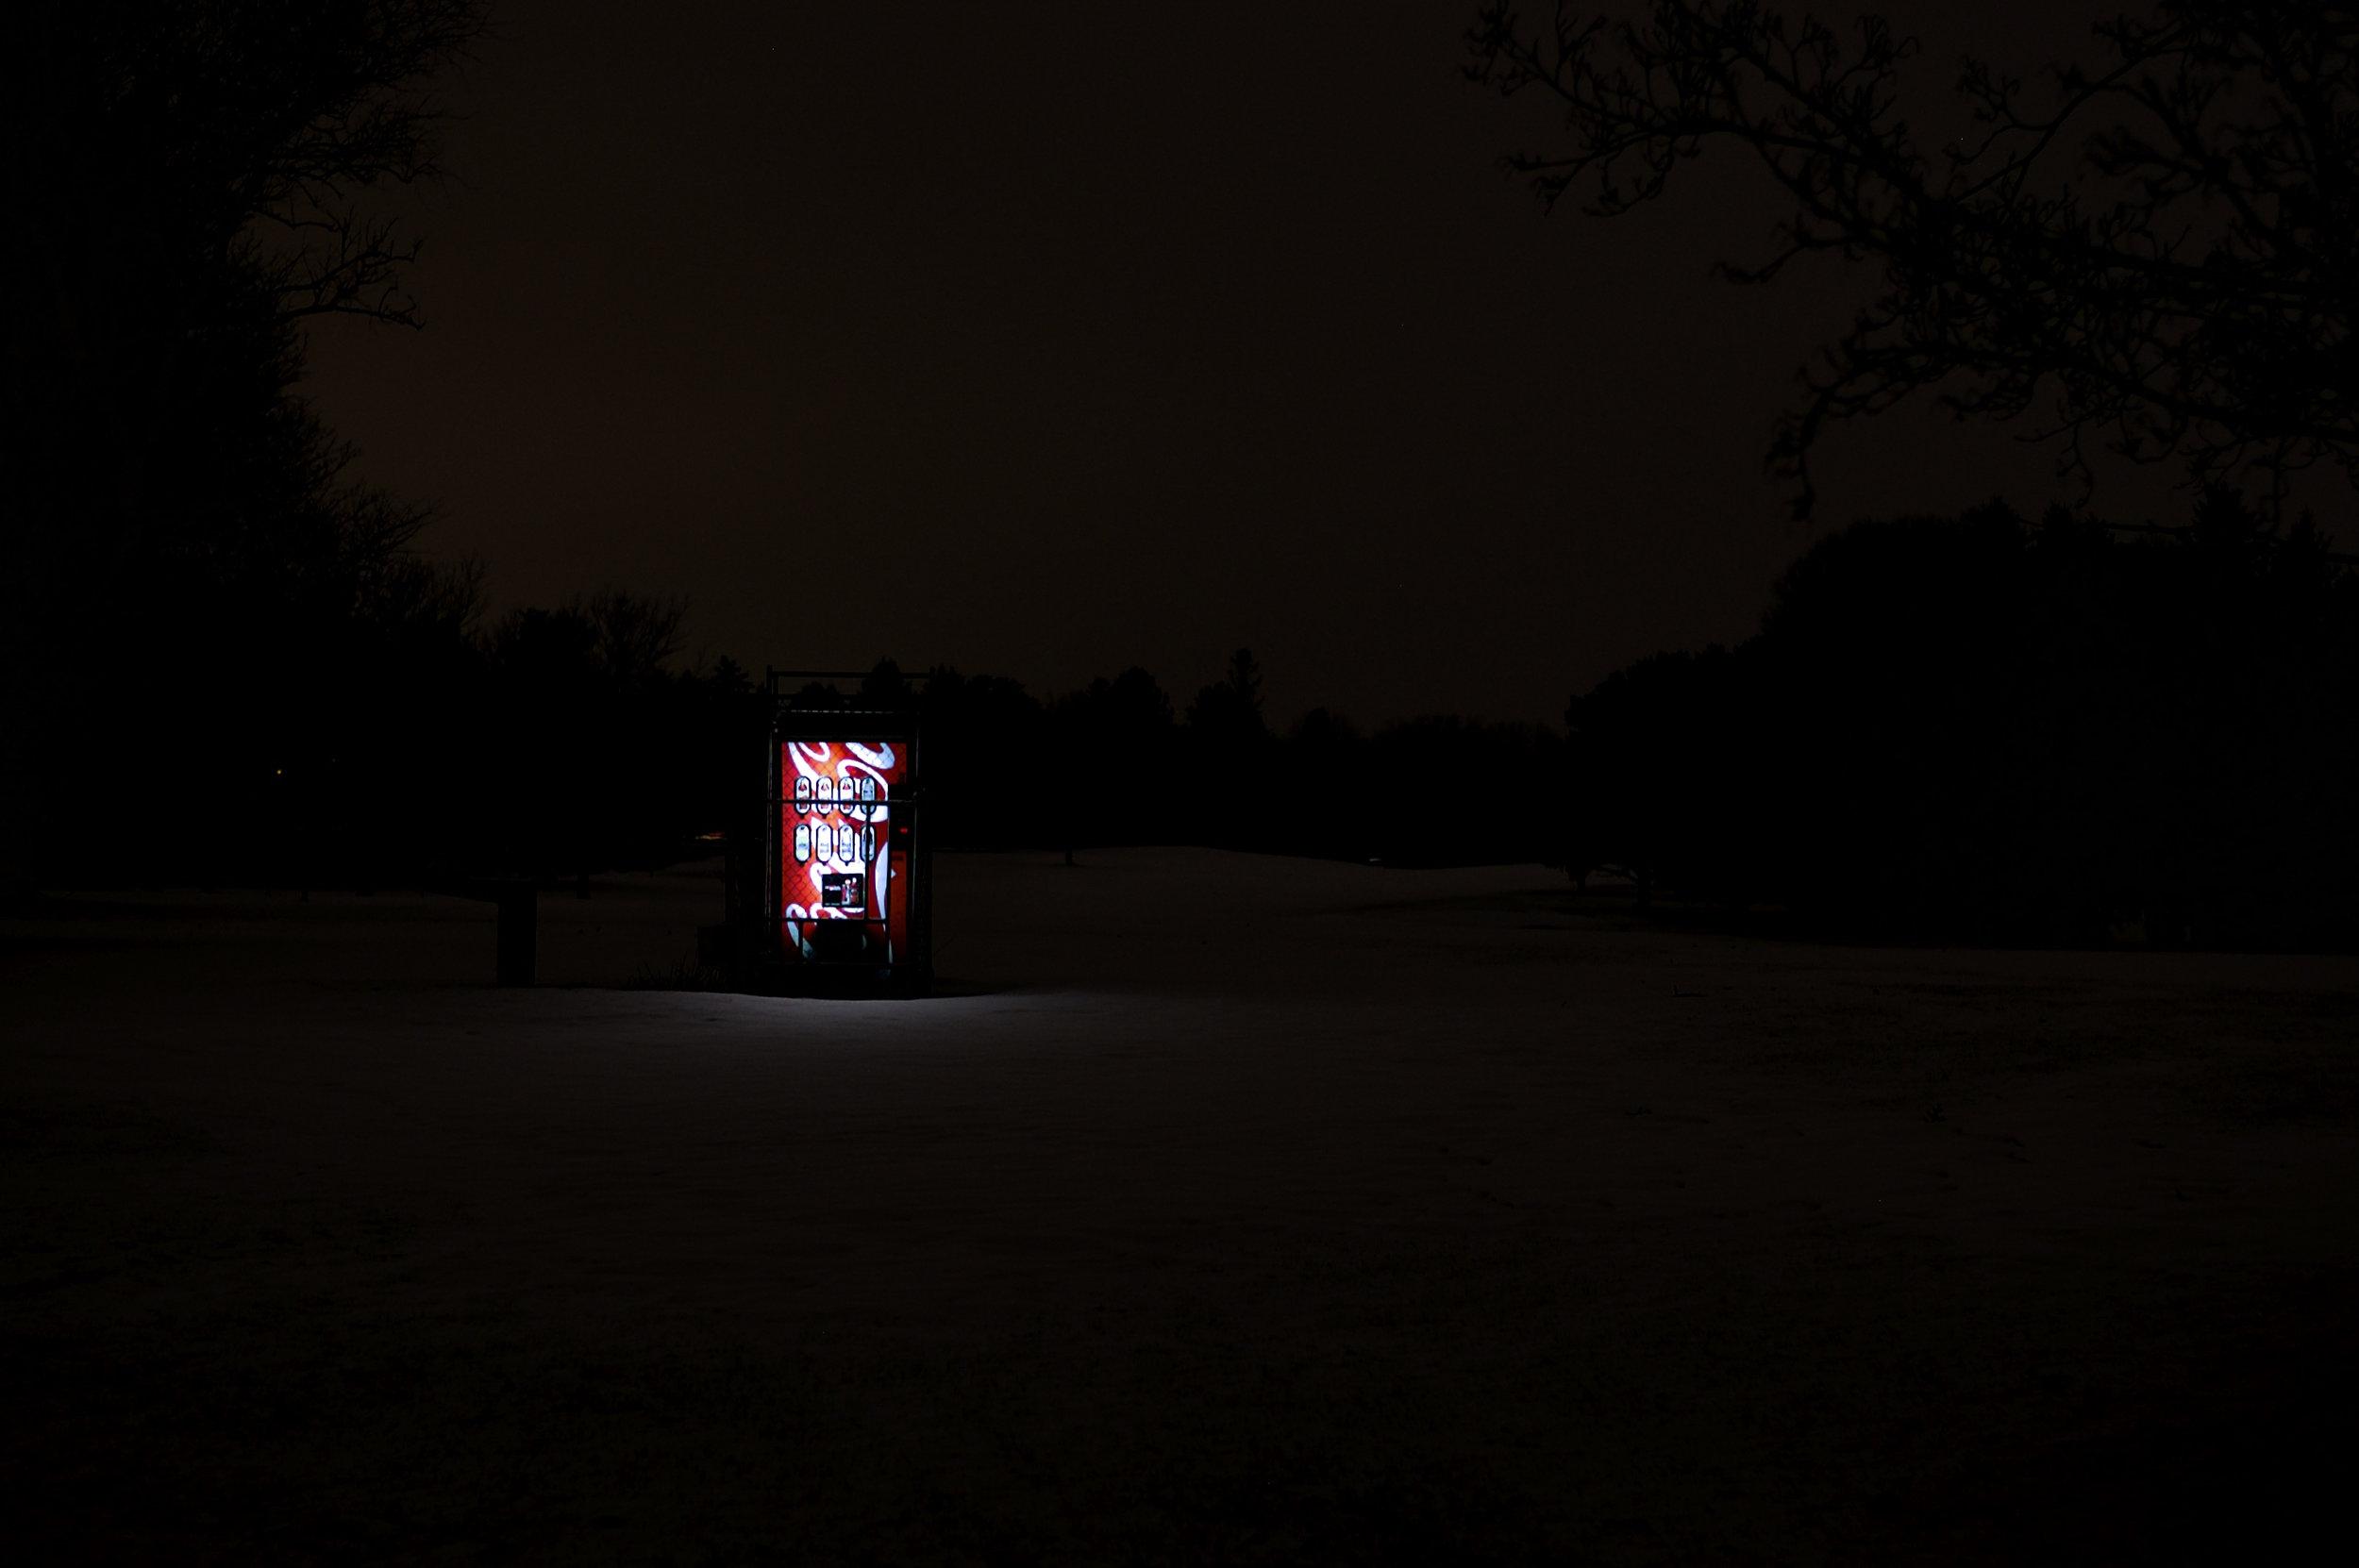 Vending Machine. Odana Hills Golf Course. Madison, Wisconsin. February 2012. © William D. Walker